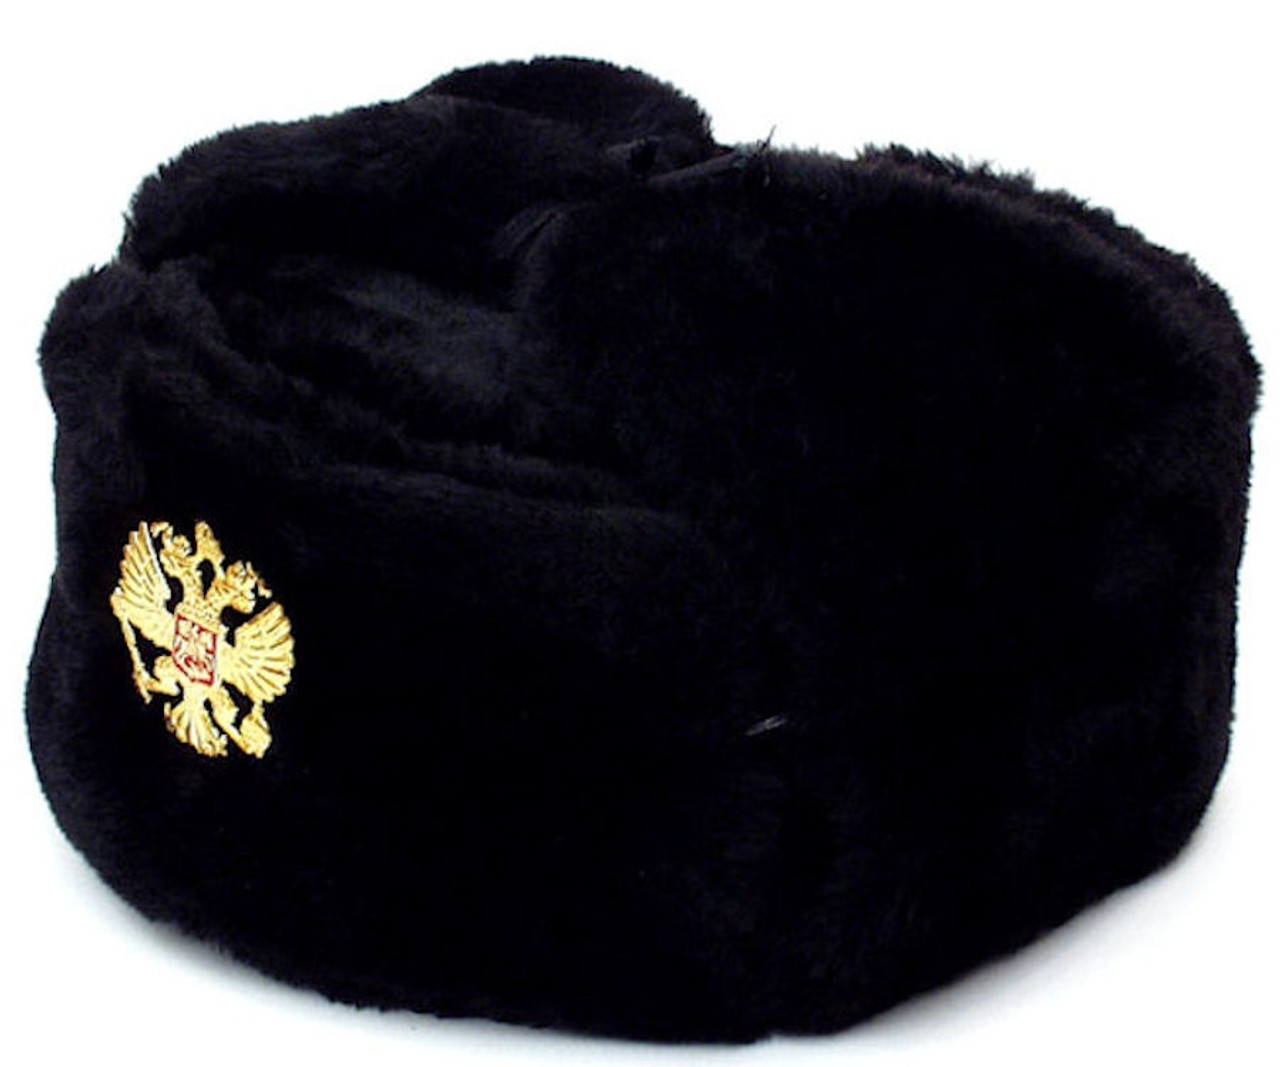 Authentic Russian Military Black Ushanka Hat Soviet Imperial Eagle Badge 5dbaca2f6cae